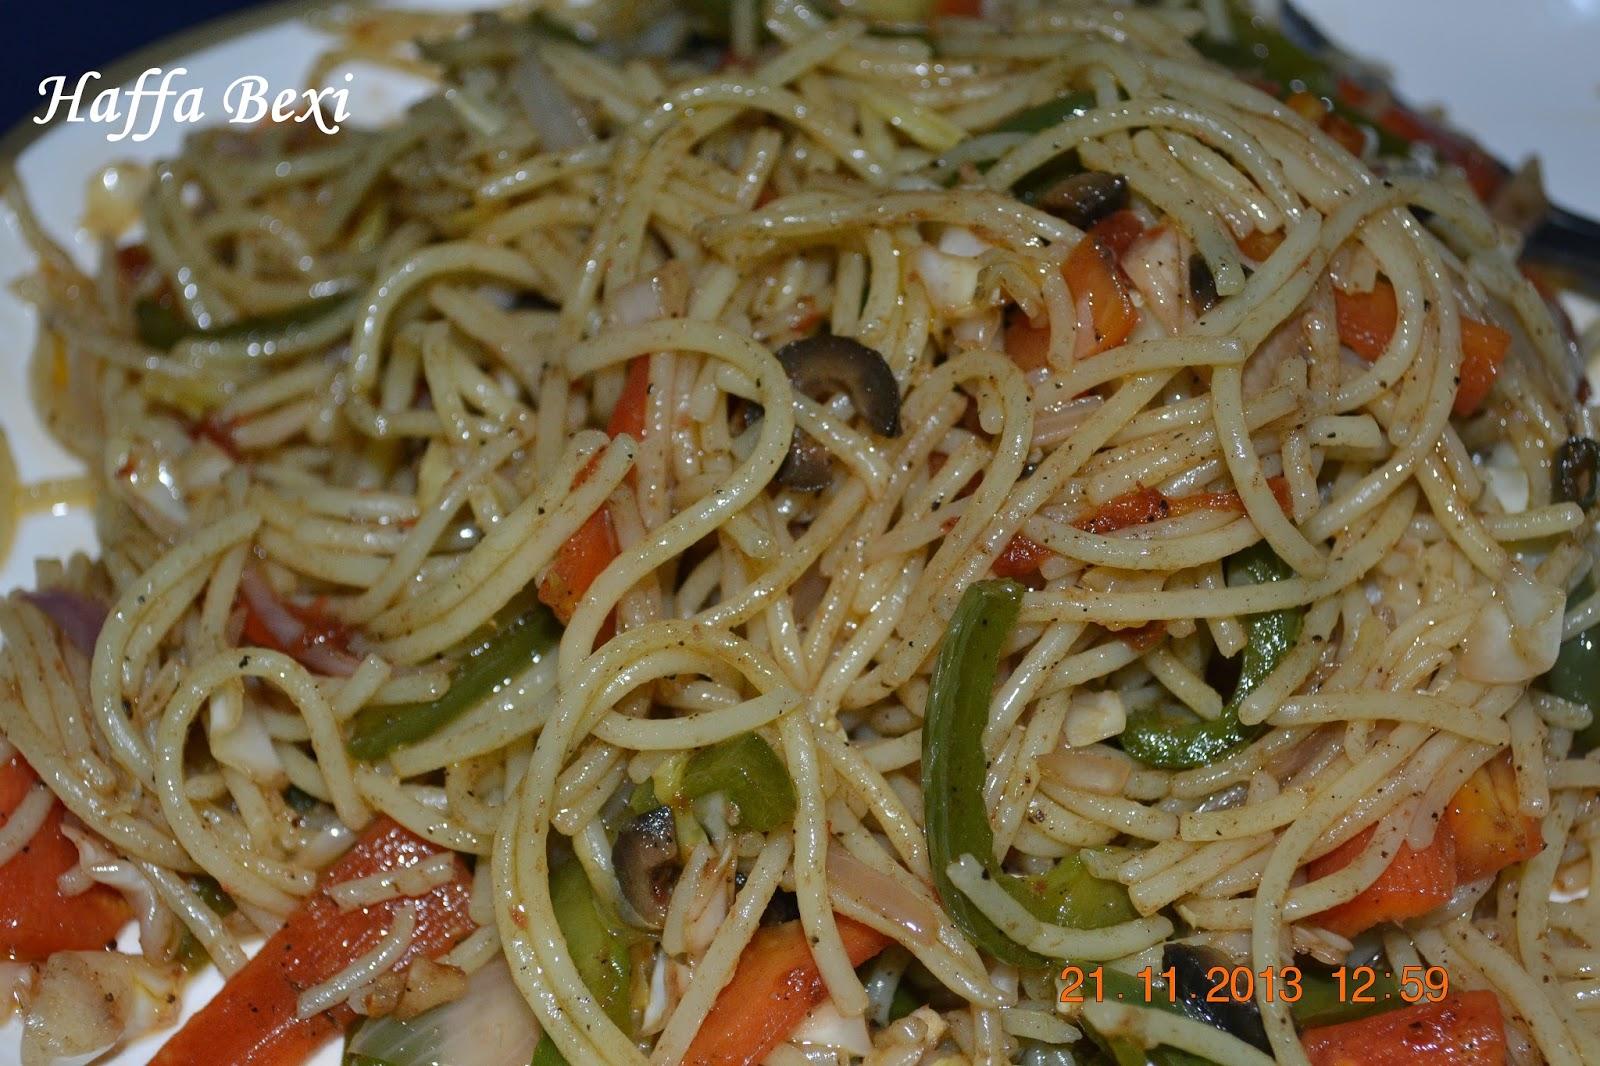 Capsicum, Macaroni, Pasta, Pasta & Spaghetti, Peas, Potato, Snacks, Sphagettis